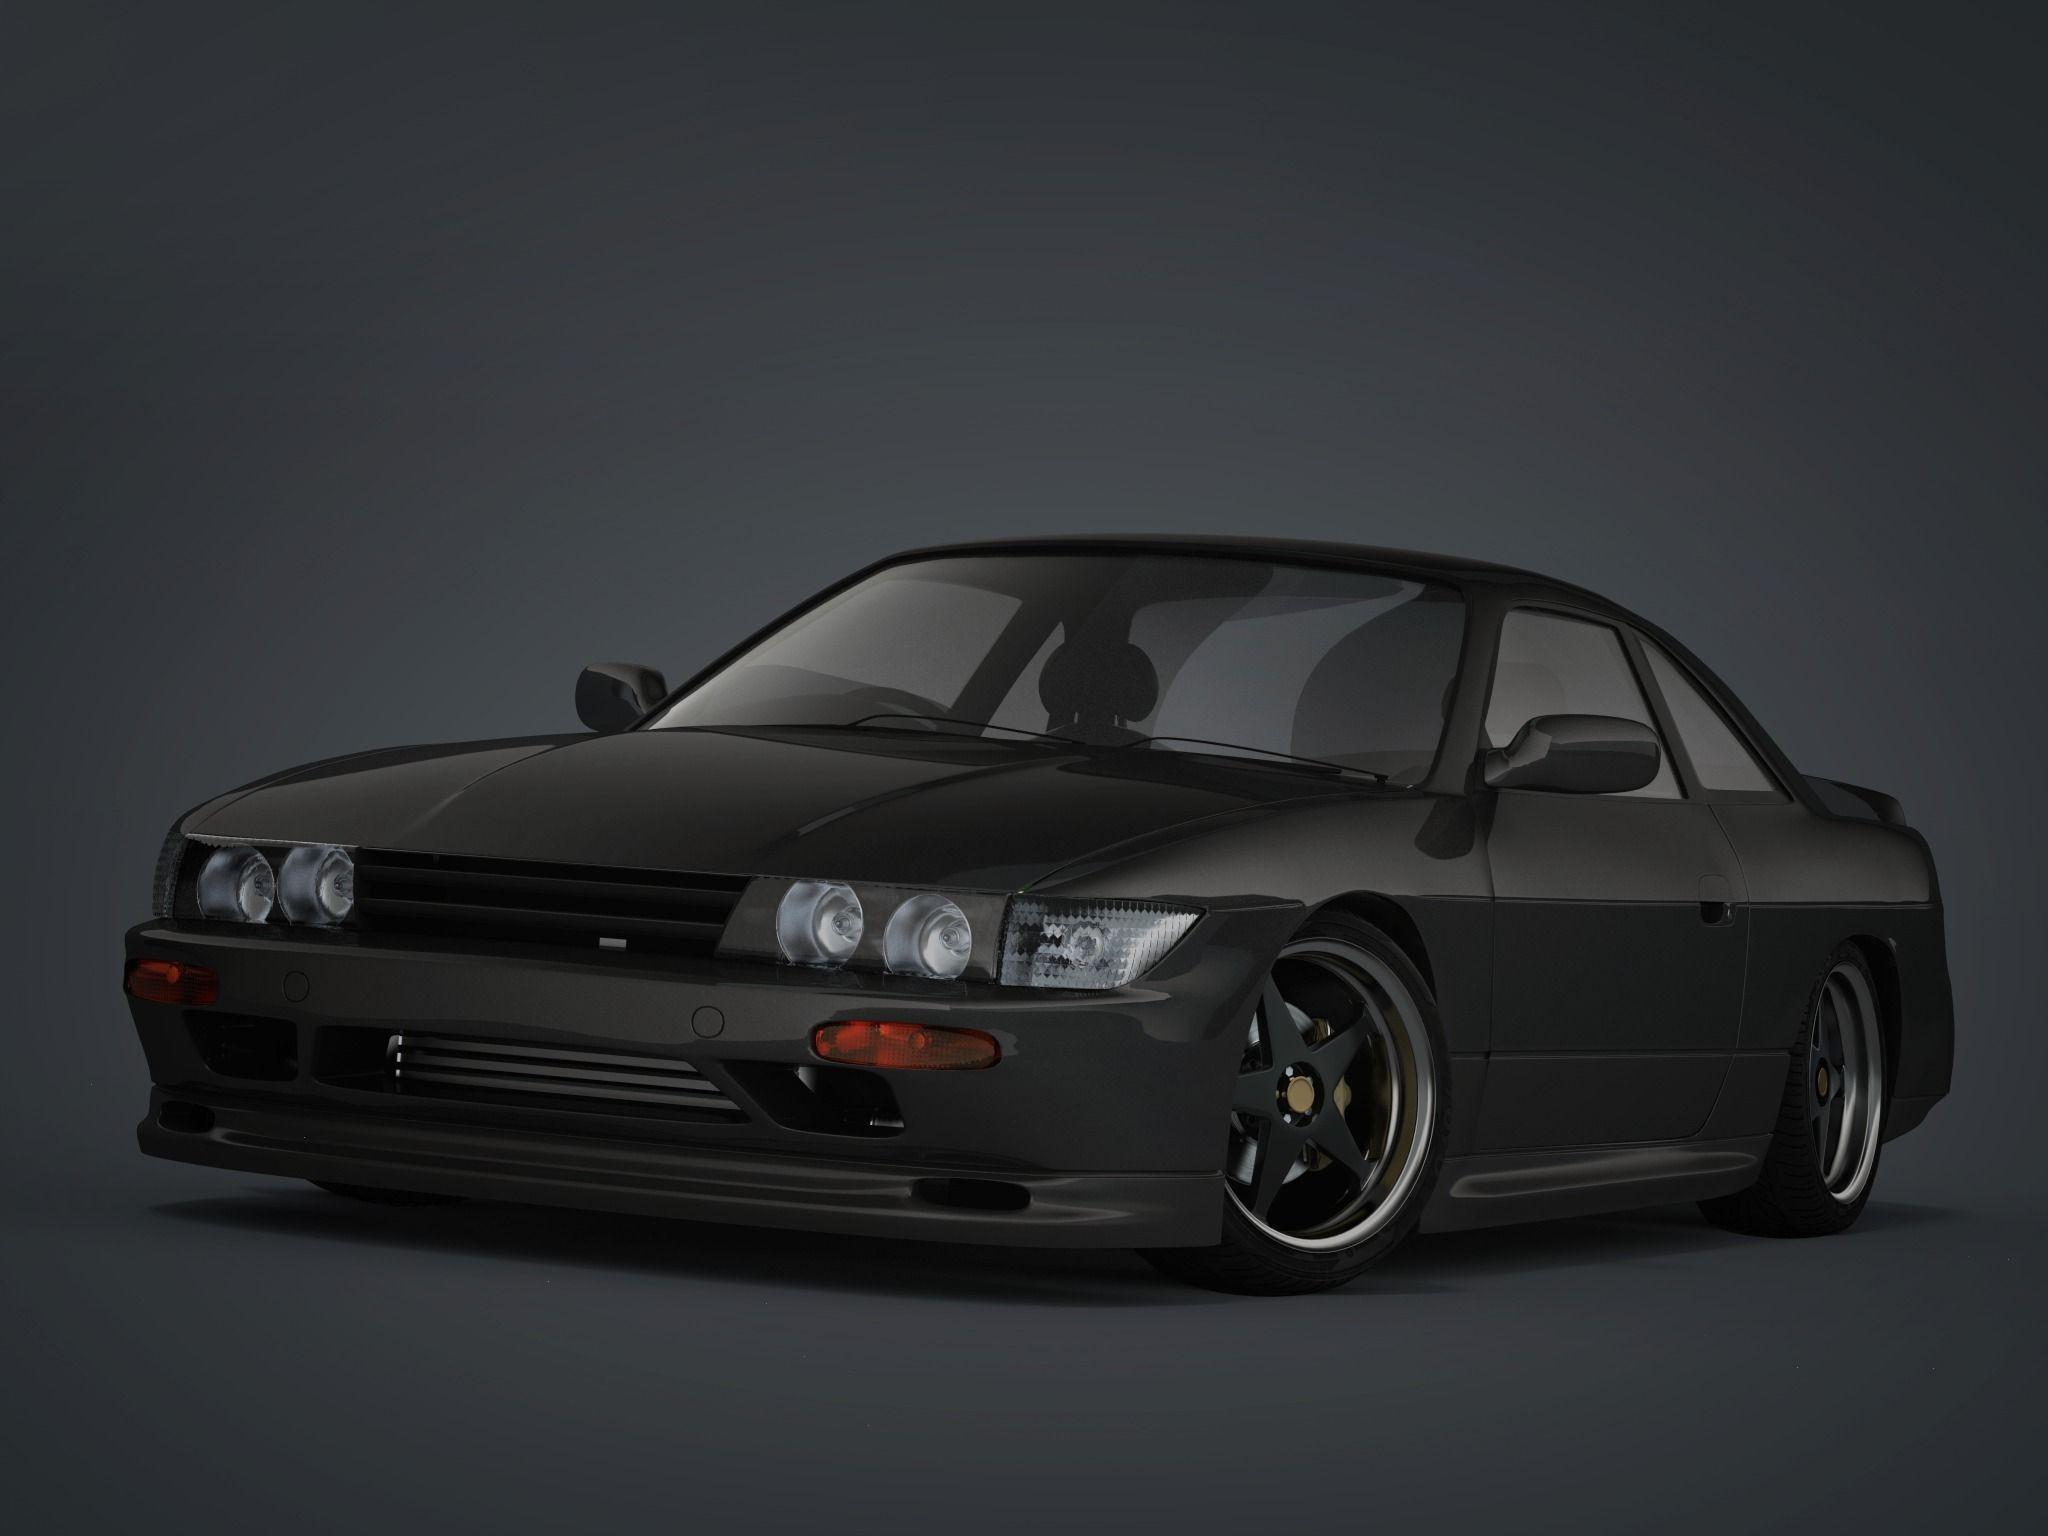 Nissan Silvia S13 1994